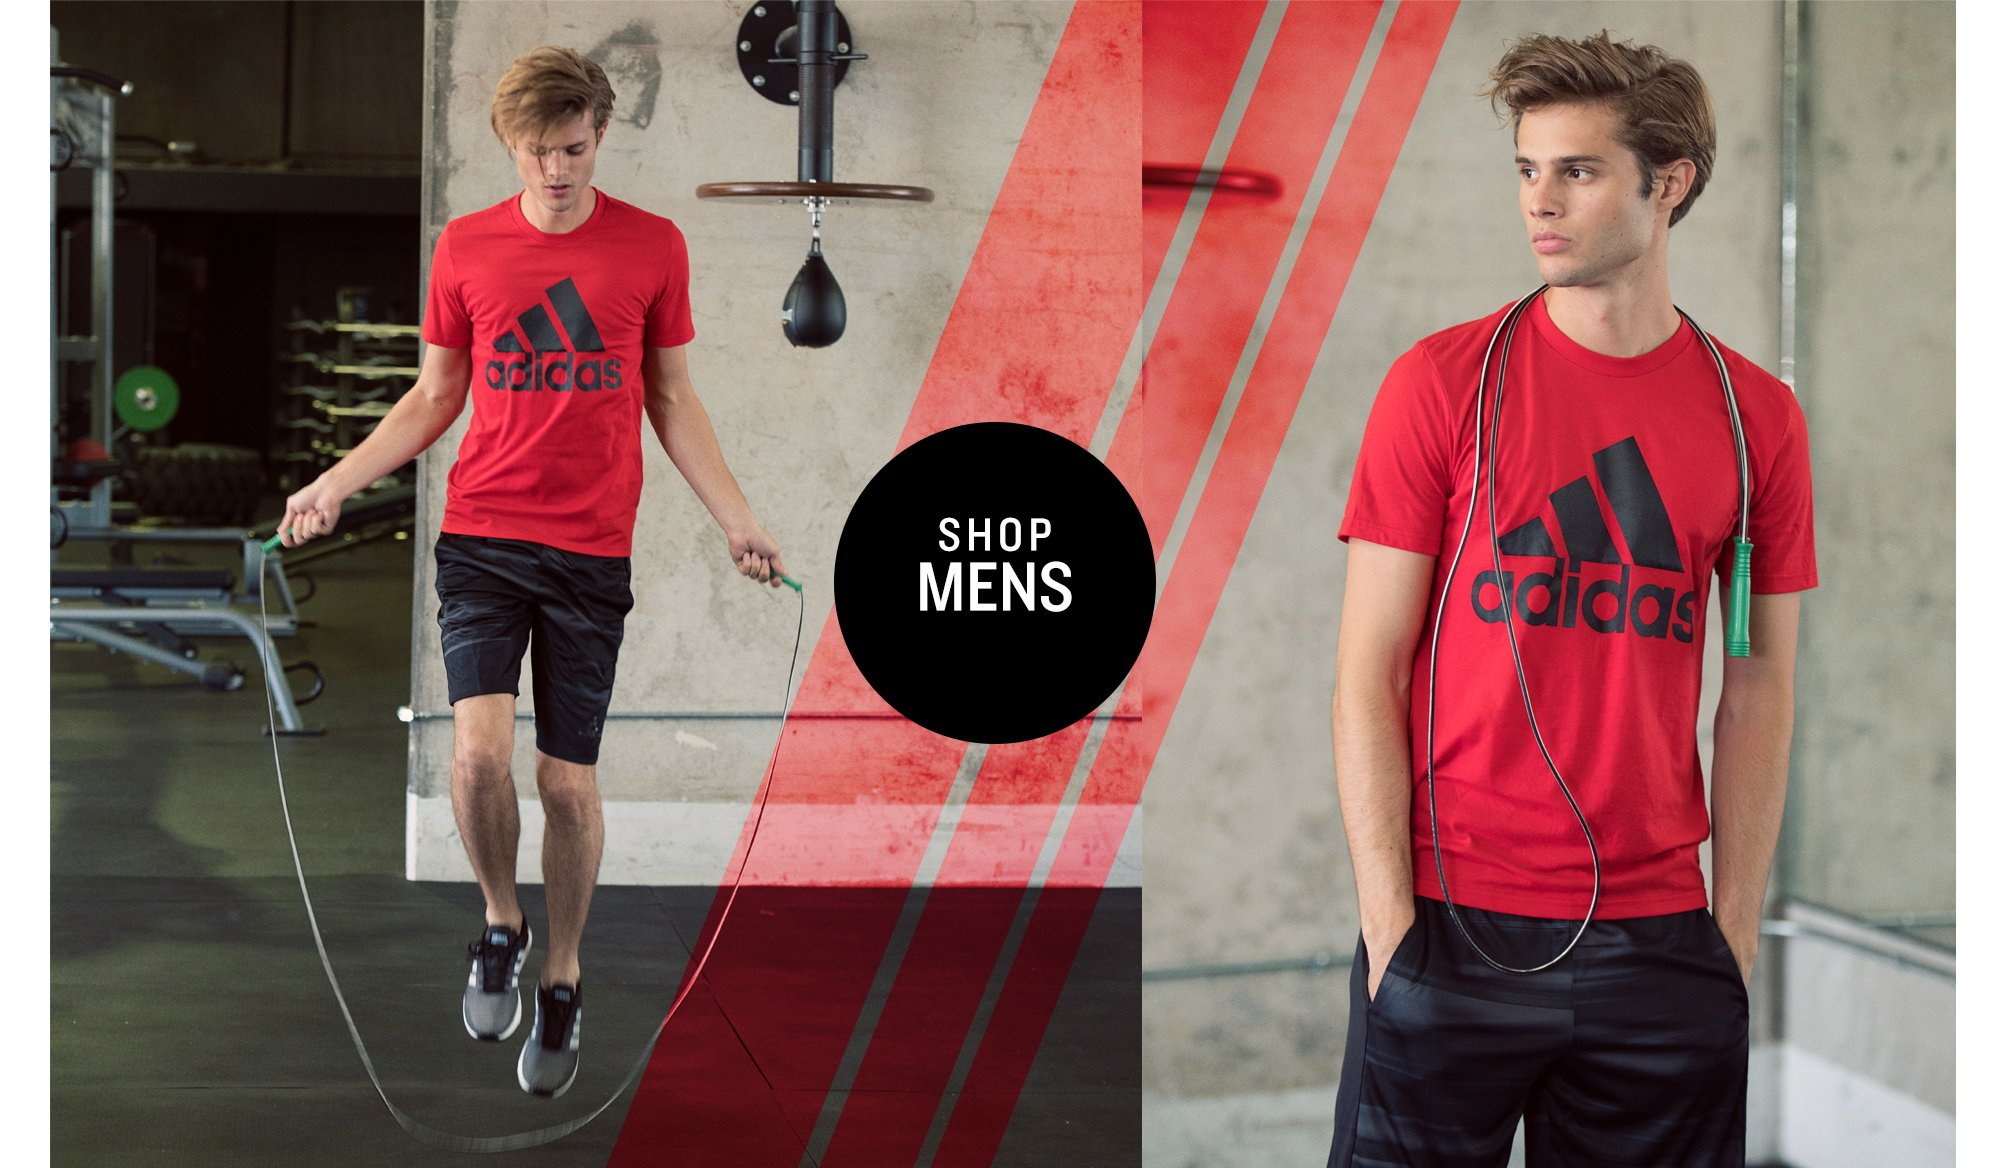 adidas - Shop Mens